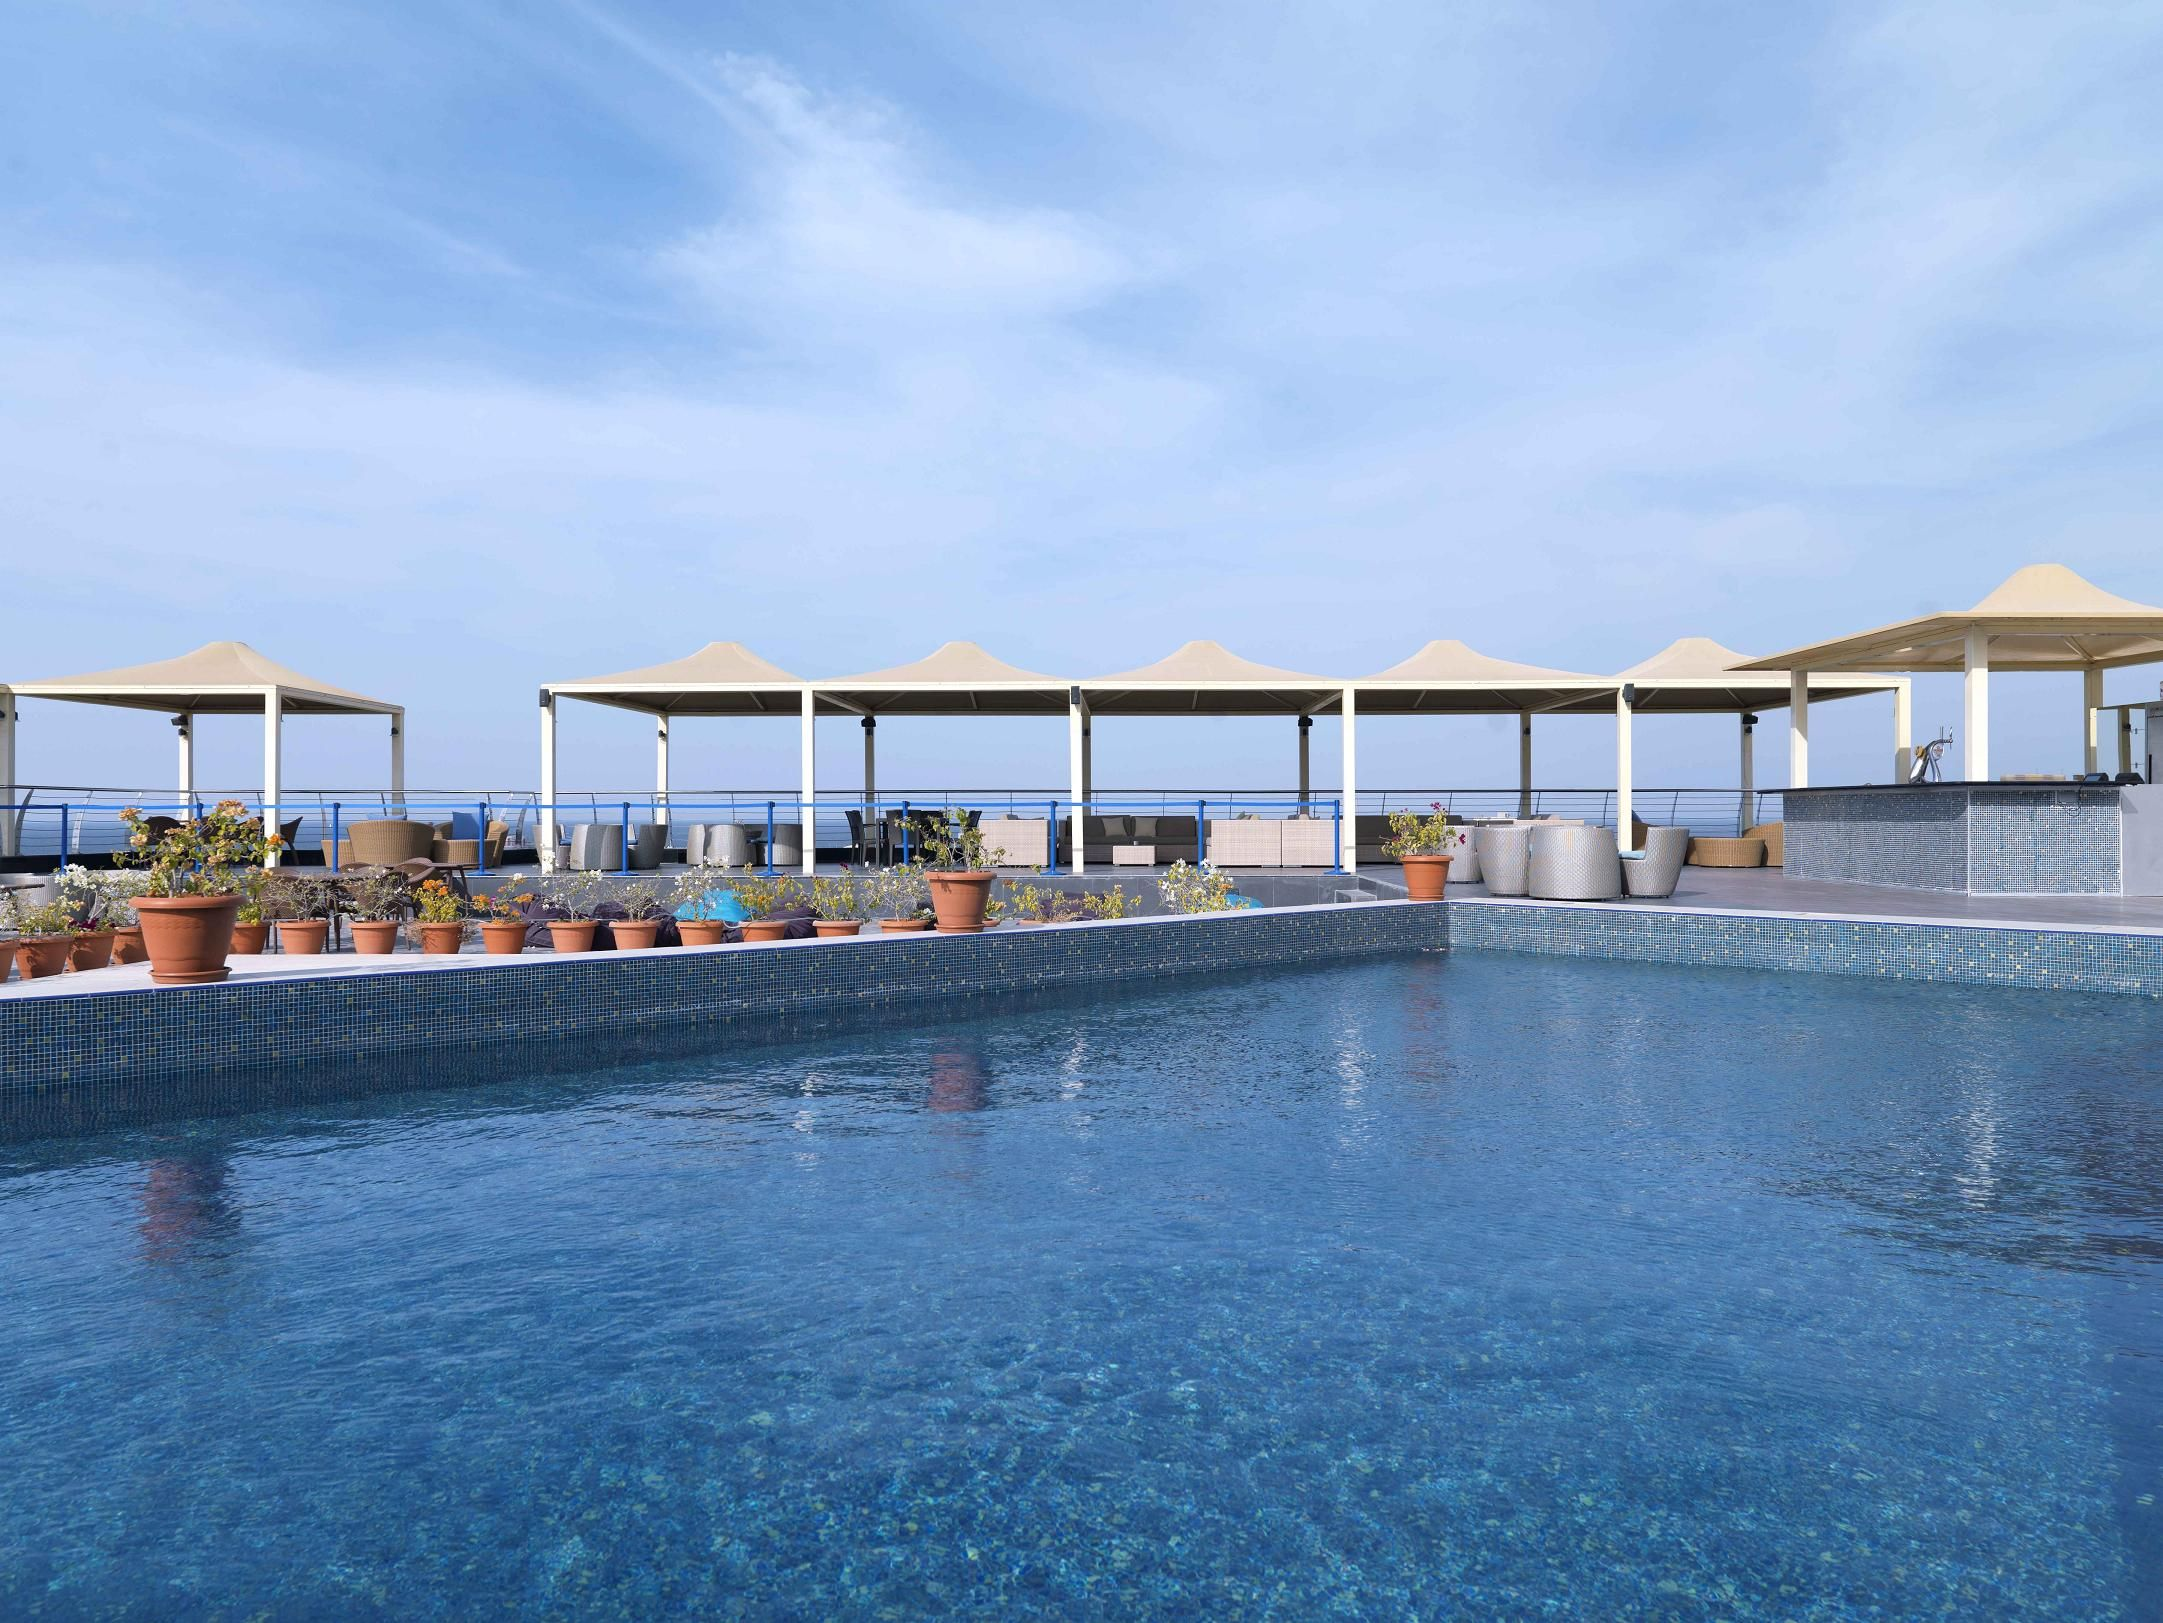 Park Inn By Radisson Muscat Hotels And Resorts Inn Radisson Hotel